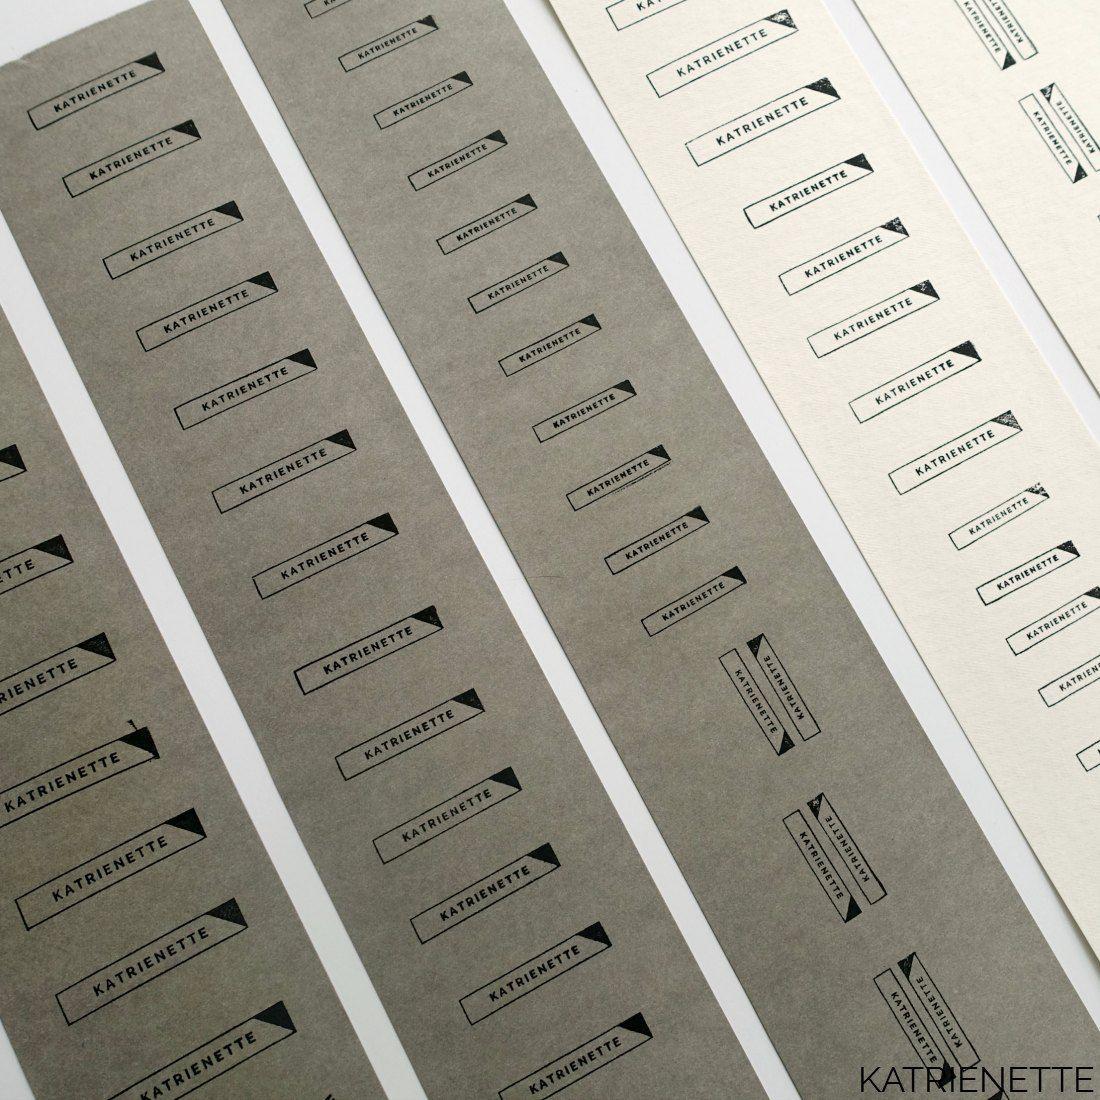 Beste Tutorial: zelf je labels maken   Kledinglabels, Labels, Naaien TL-49